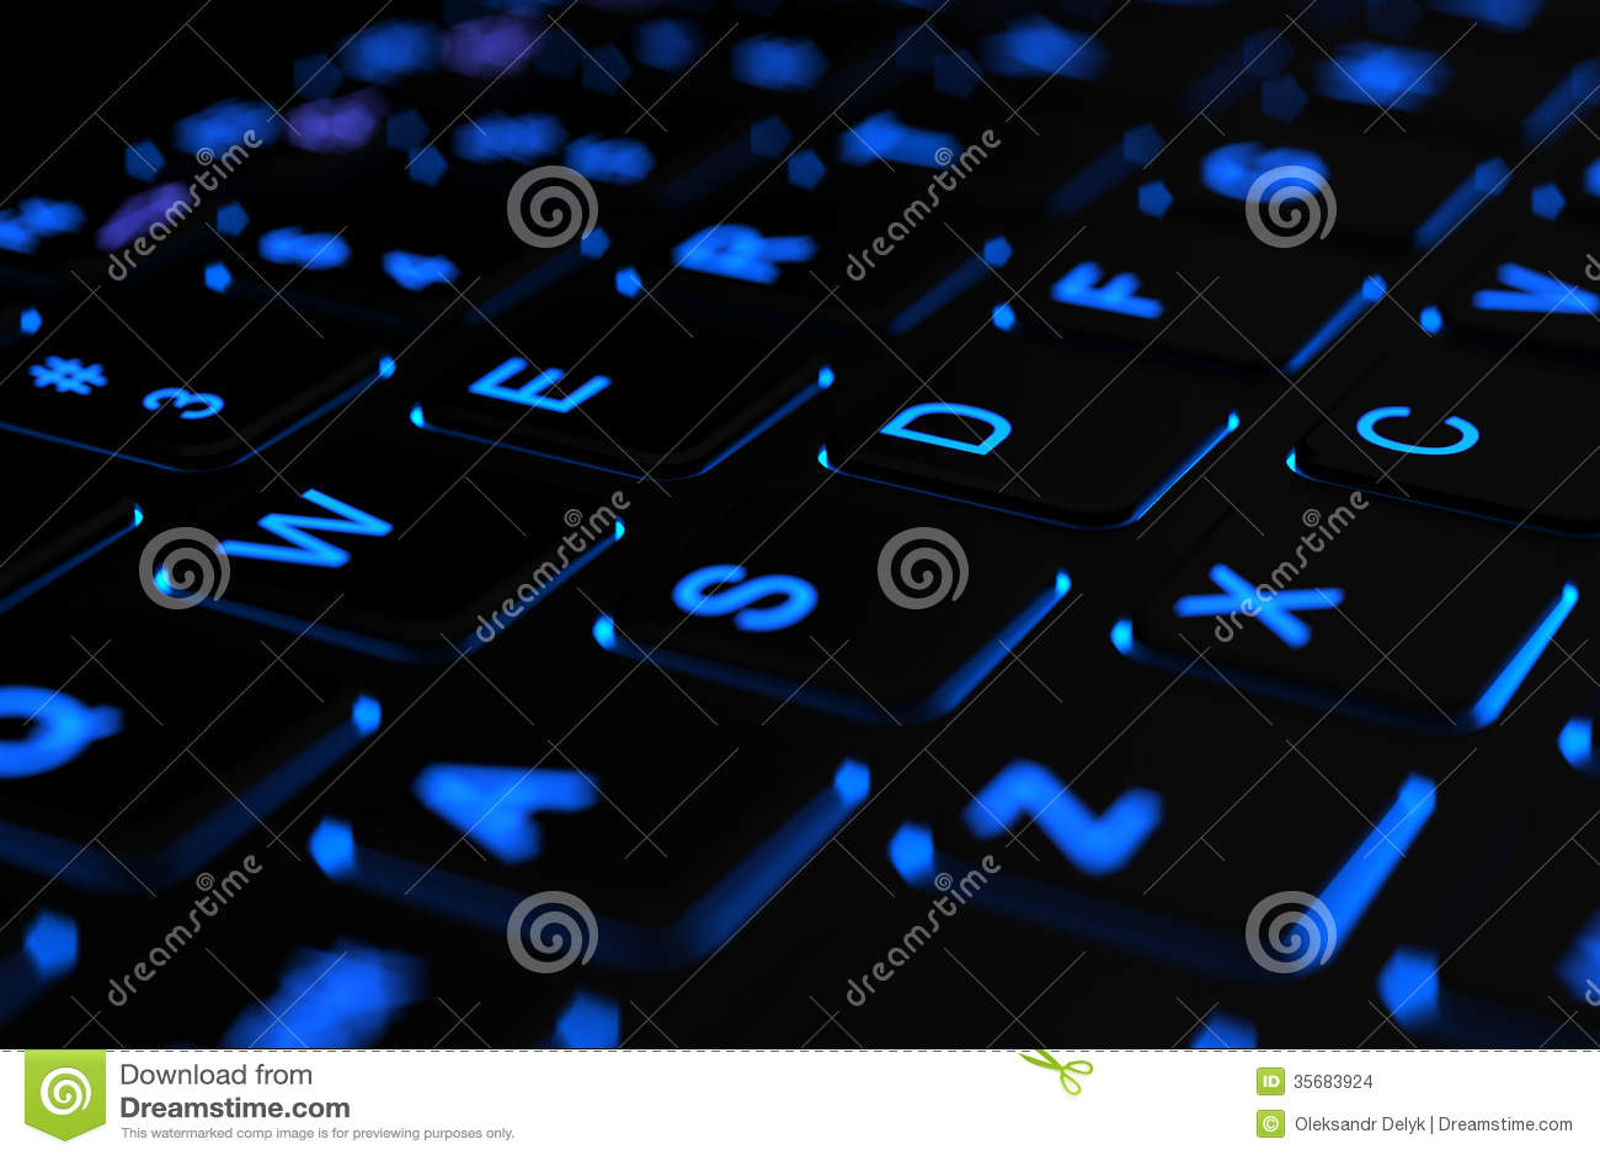 Toetsenbord Met Licht : Verlicht laptop toetsenbord stock illustratie illustratie